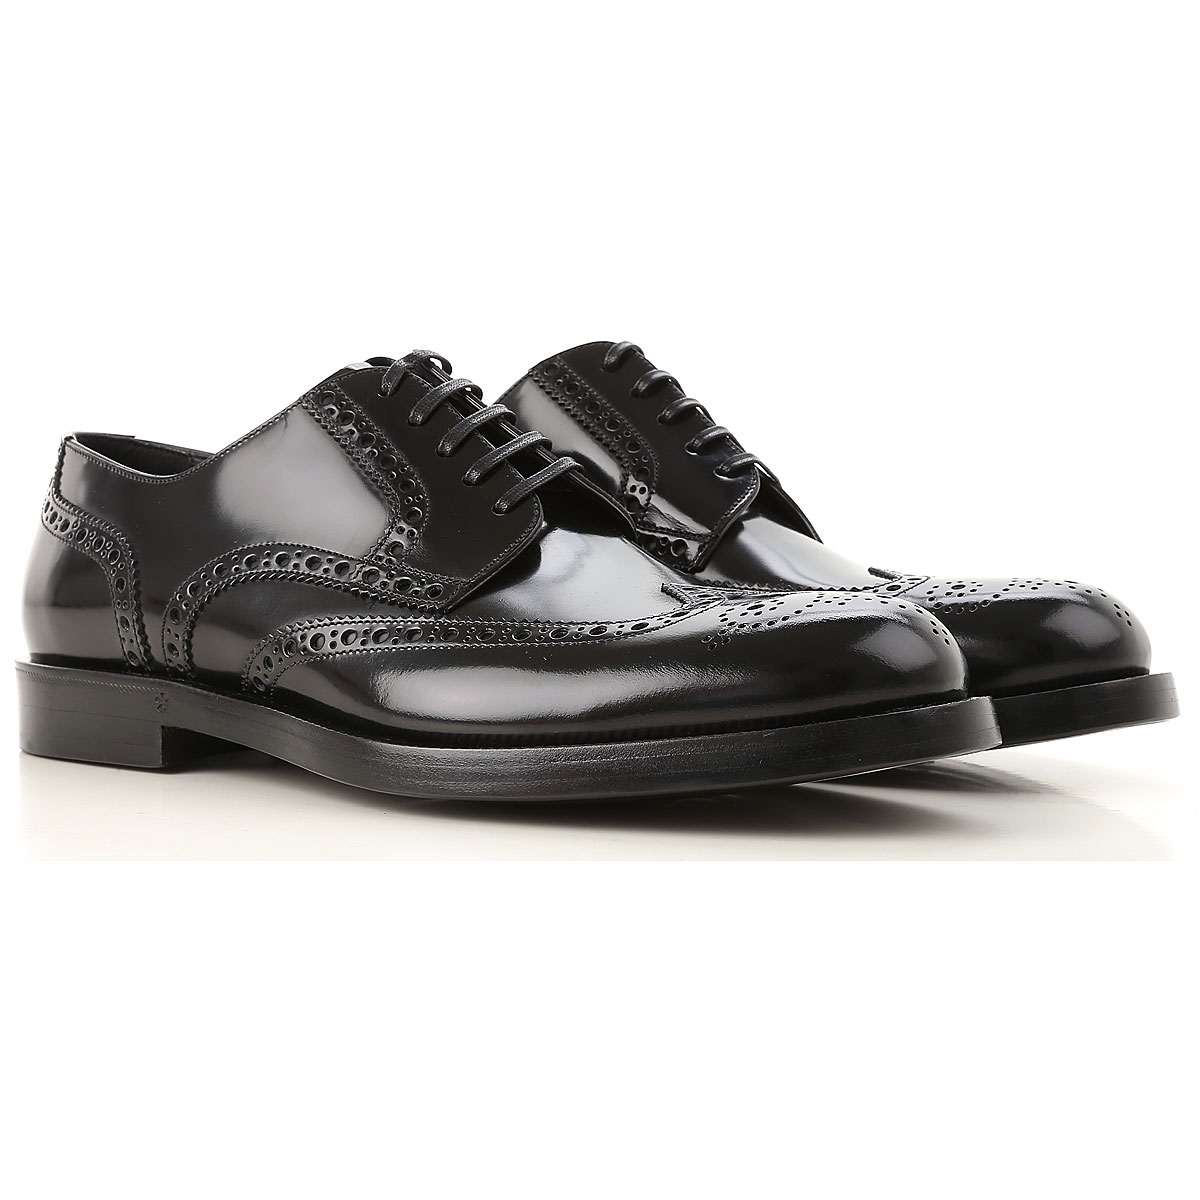 Dolce & Gabbana Brogue Shoes, Black, Leather, 2017, 10 10.5 11.5 7.5 8 8.5